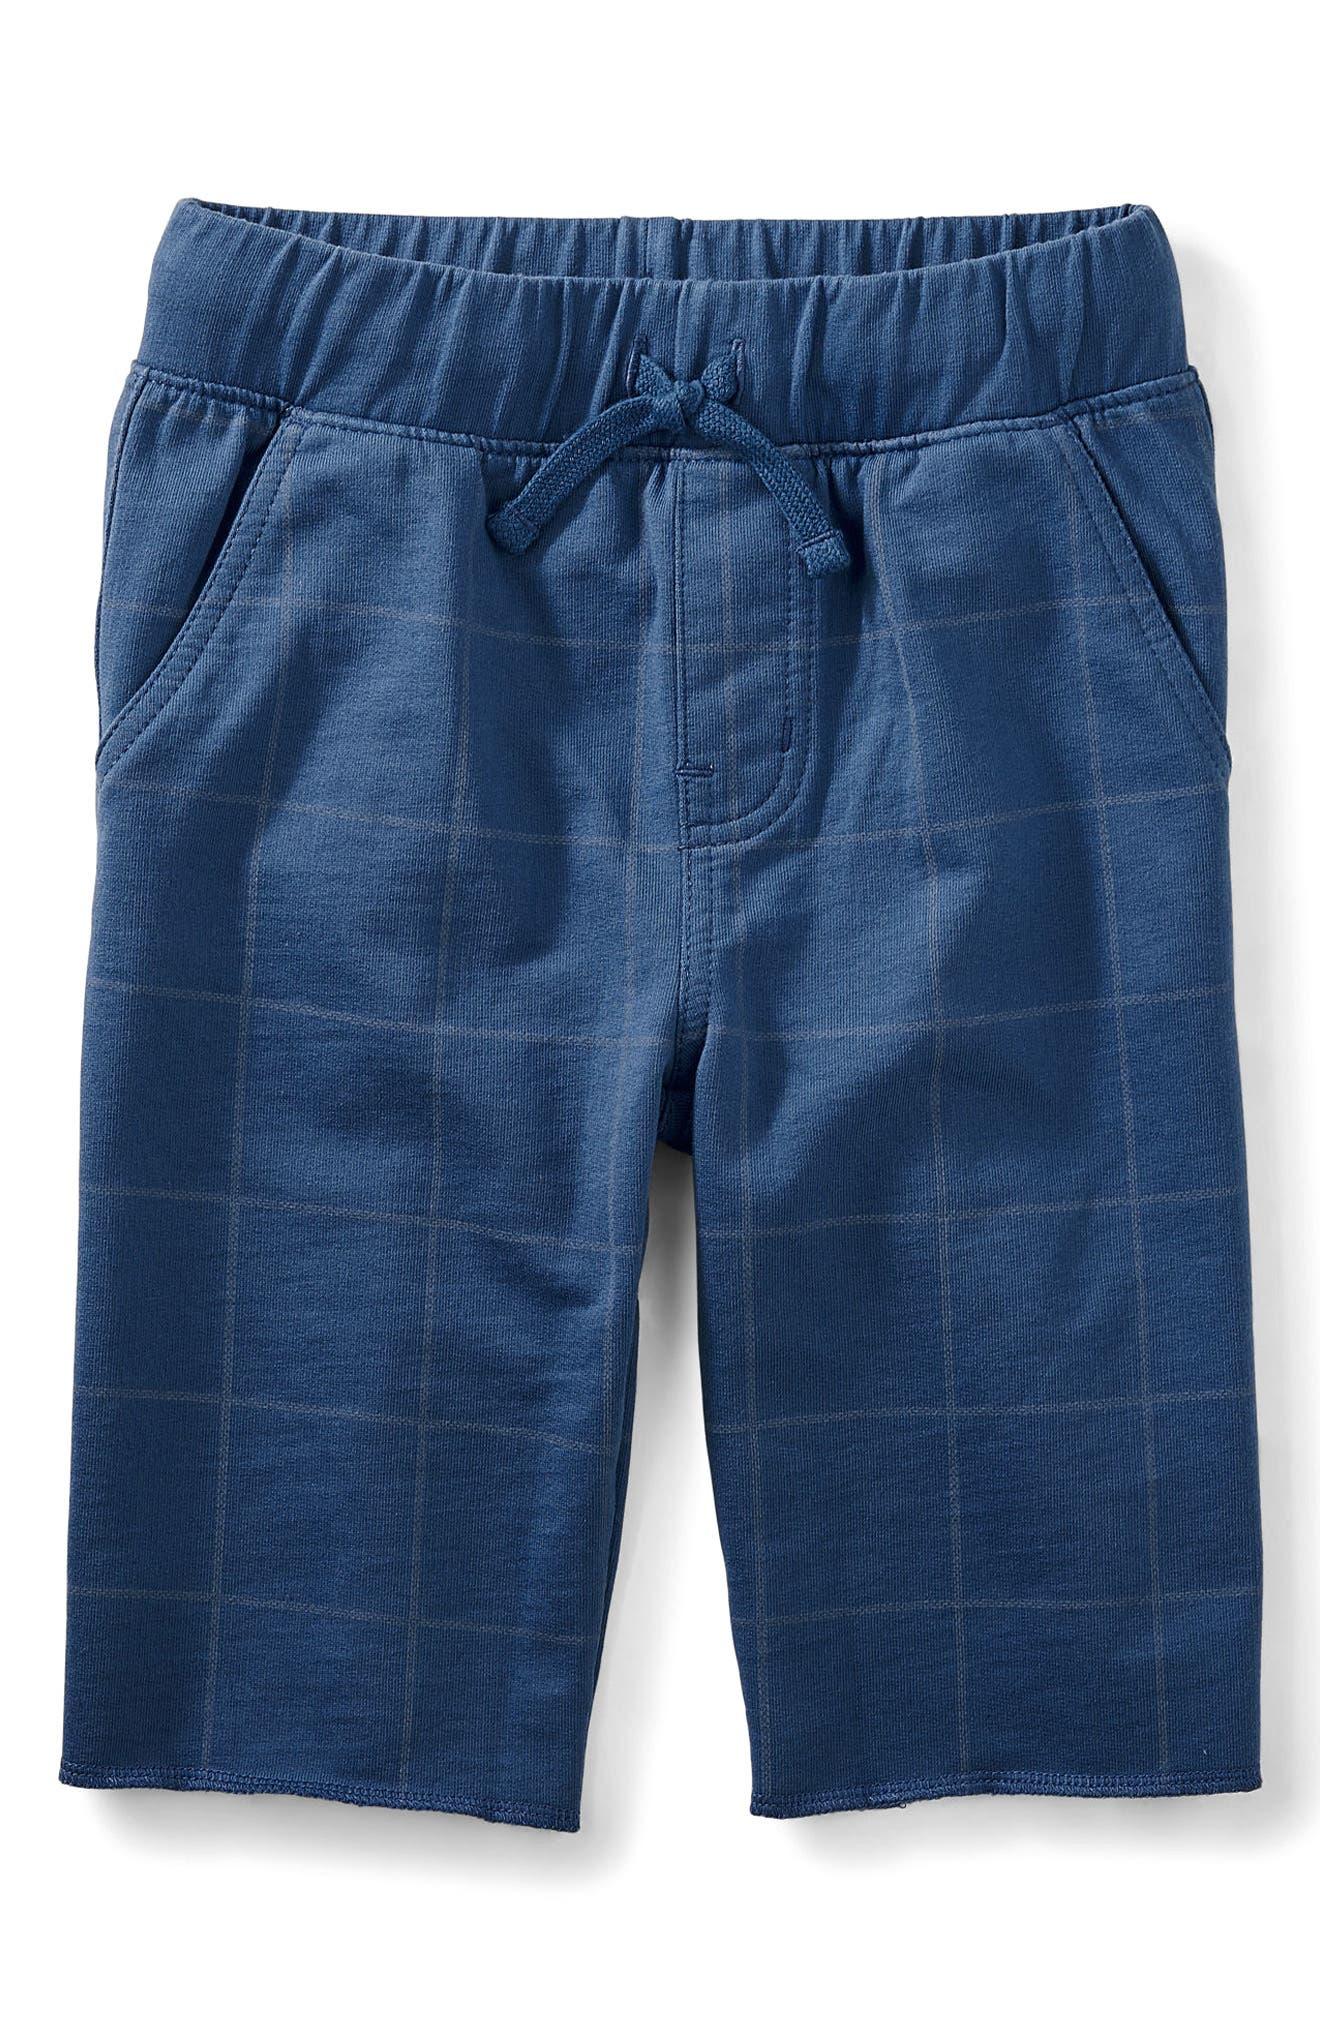 Cruiser Print Shorts,                             Main thumbnail 1, color,                             Cobalt Windowpane